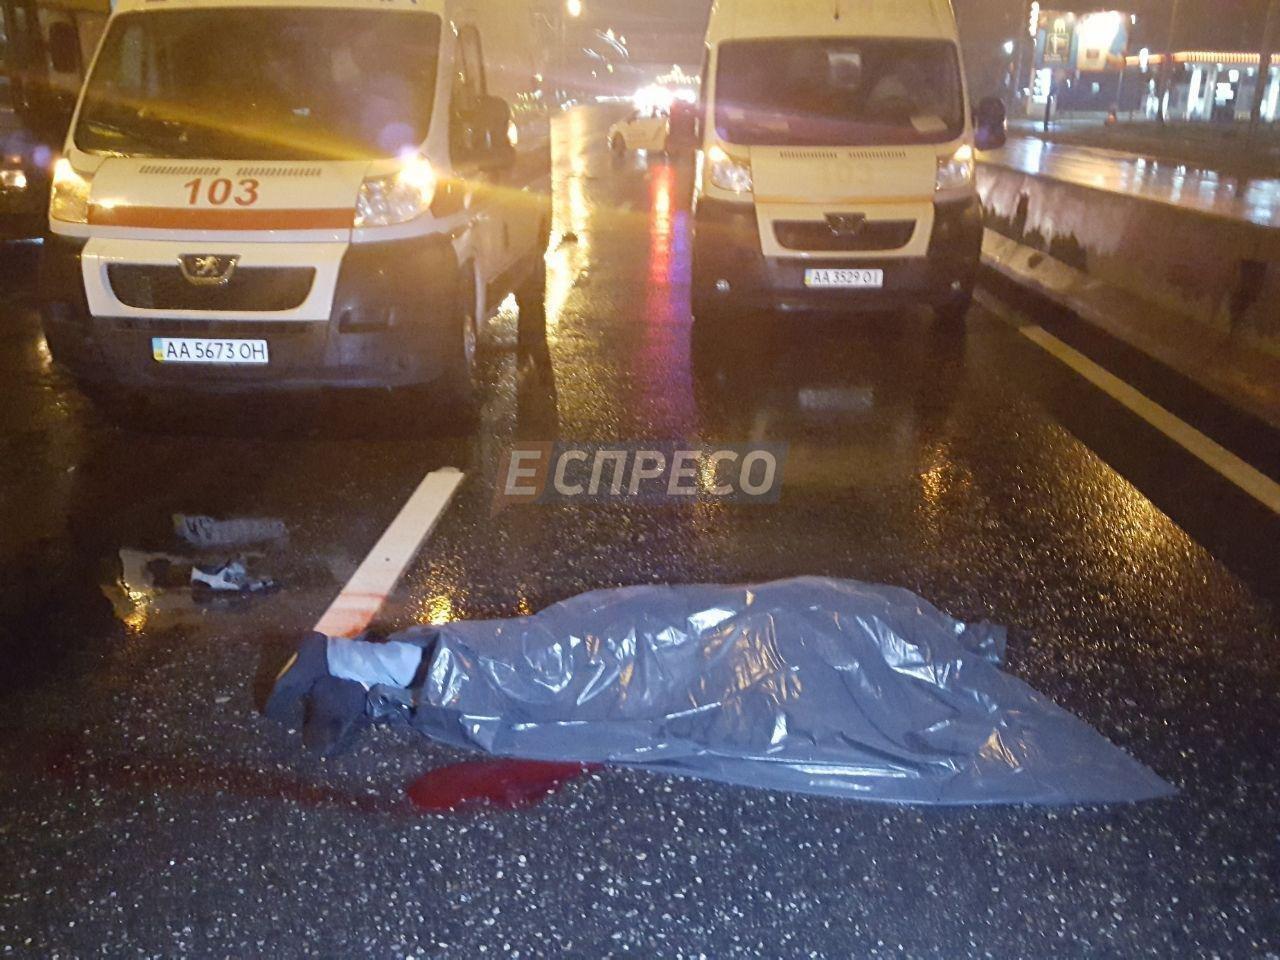 ВКиеве VW сбил водителя троллейбуса